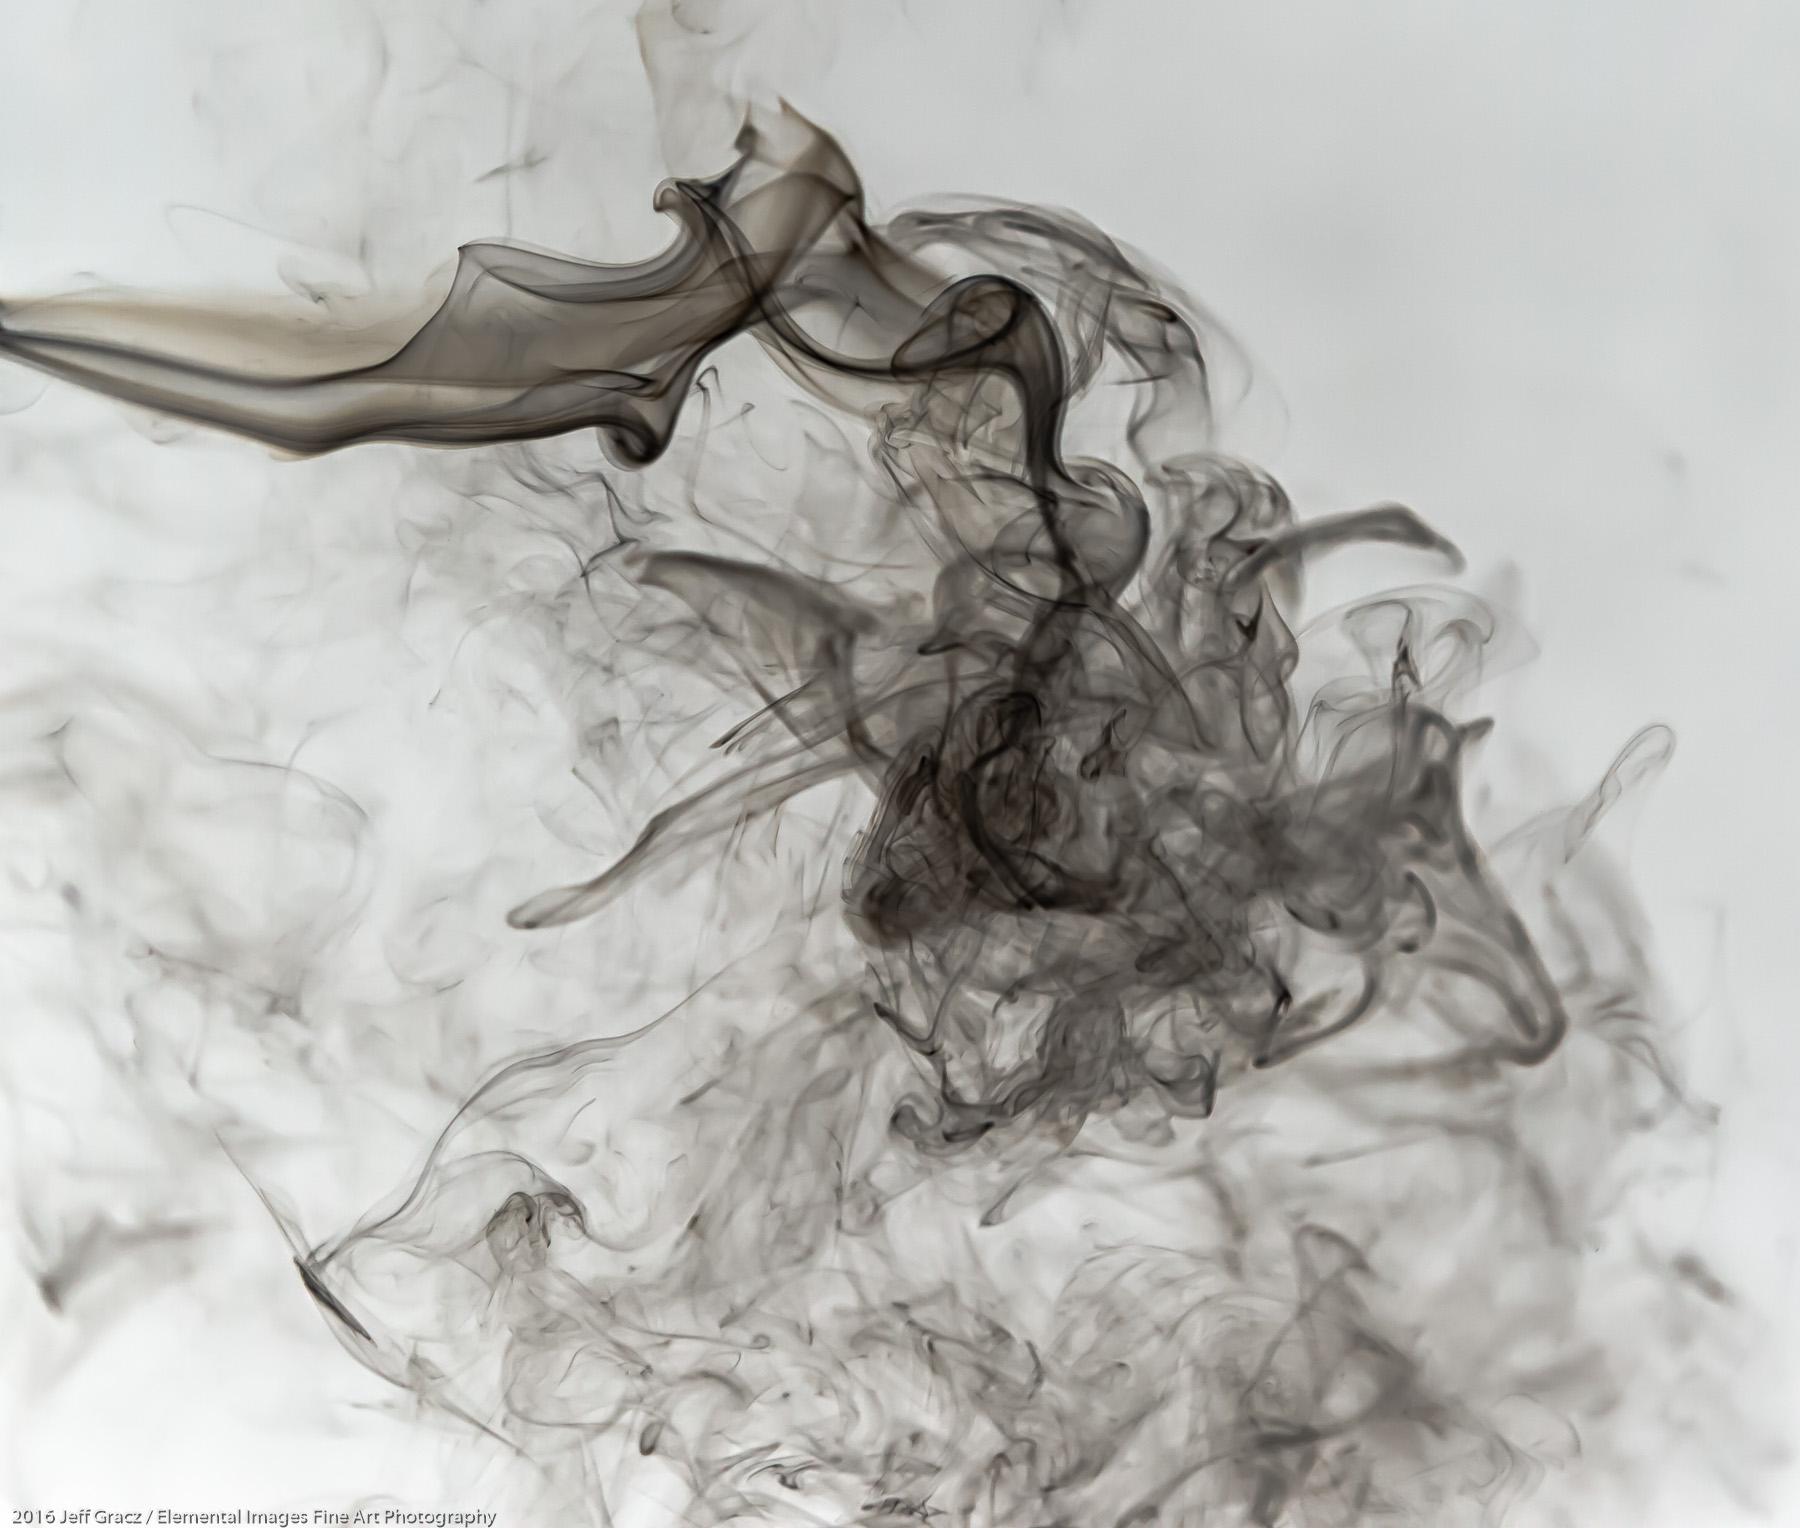 Smoke 36 | Vancouver | WA | USA - © 2016 Jeff Gracz / Elemental Images Fine Art Photography - All Rights Reserved Worldwide